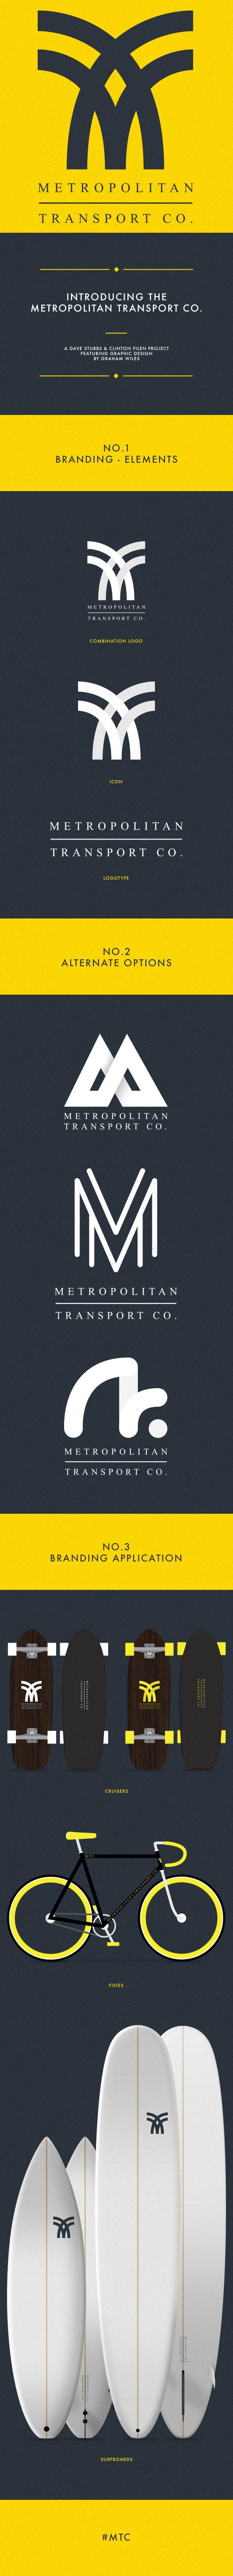 METROPOLITAN TRANSPORT CO. on Behance